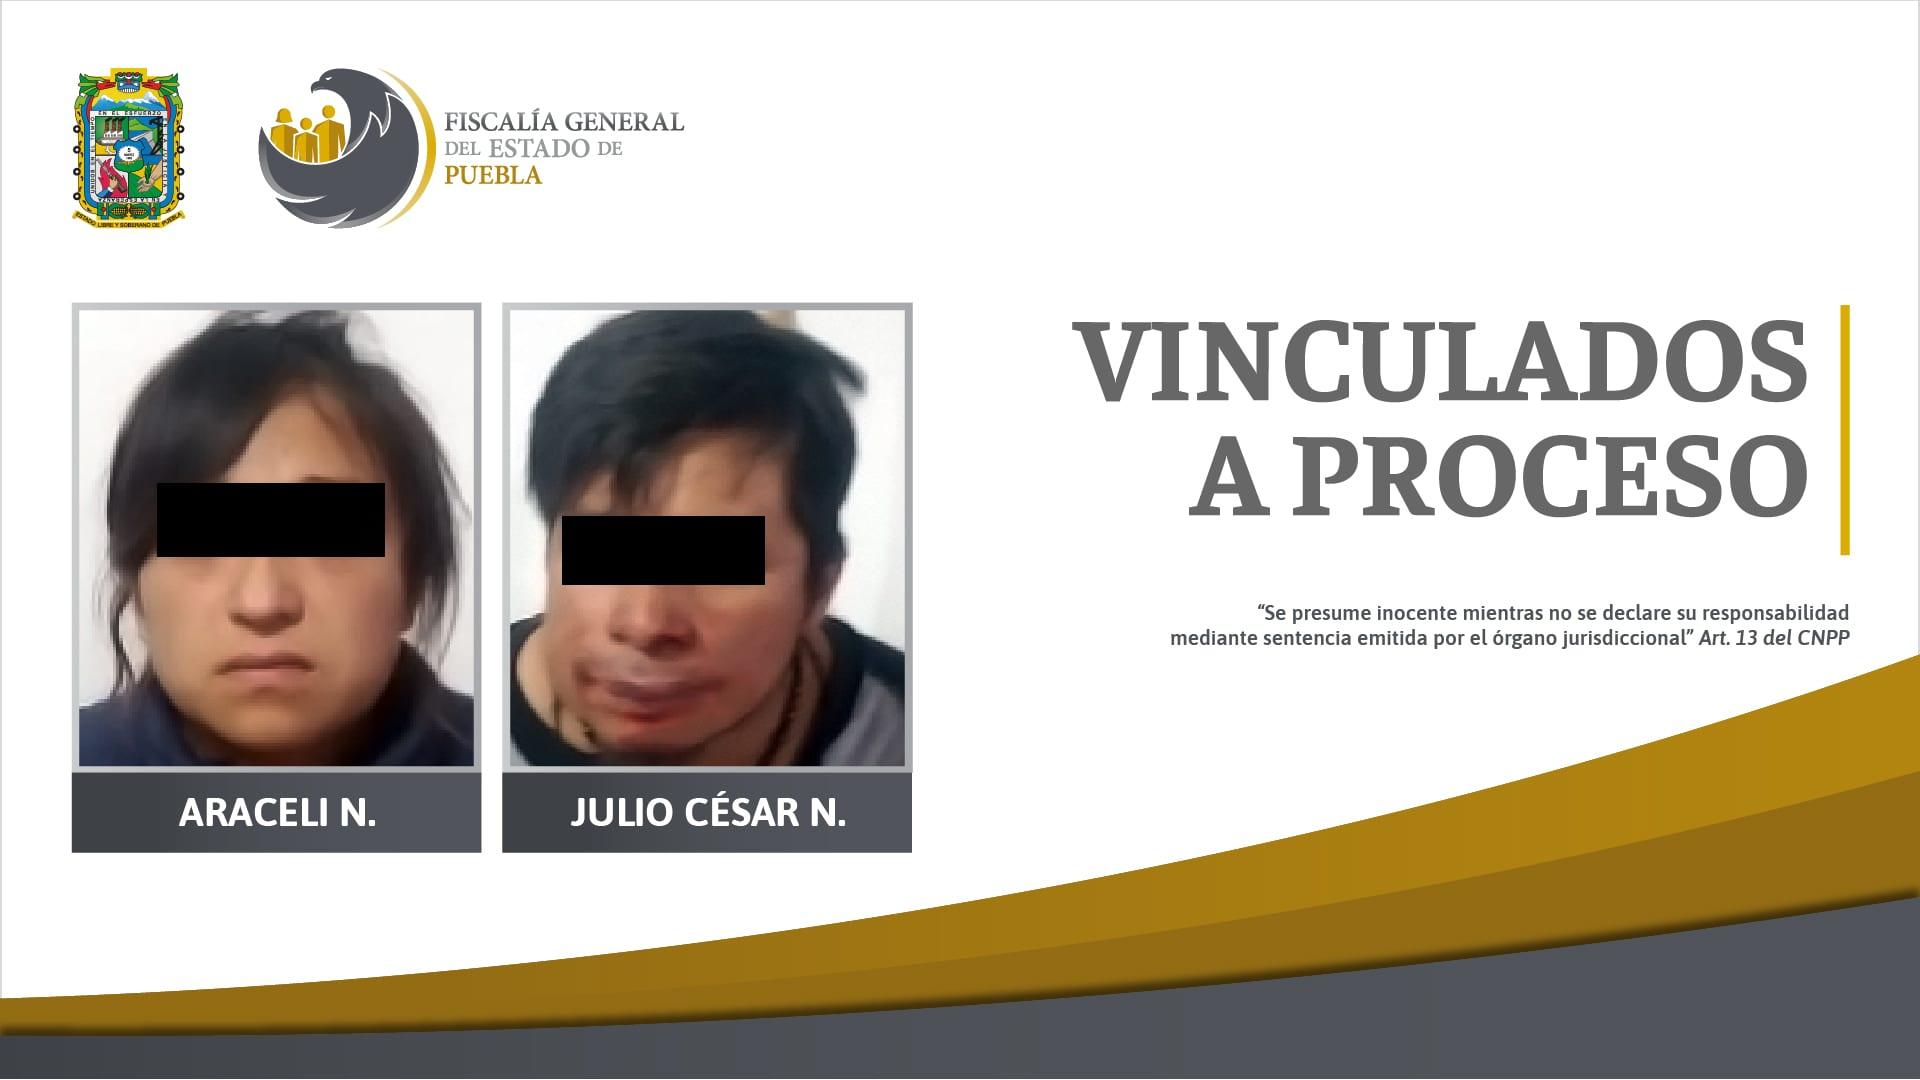 Por robo de vehículo en Zacapoaxtla, pareja vinculada a proceso